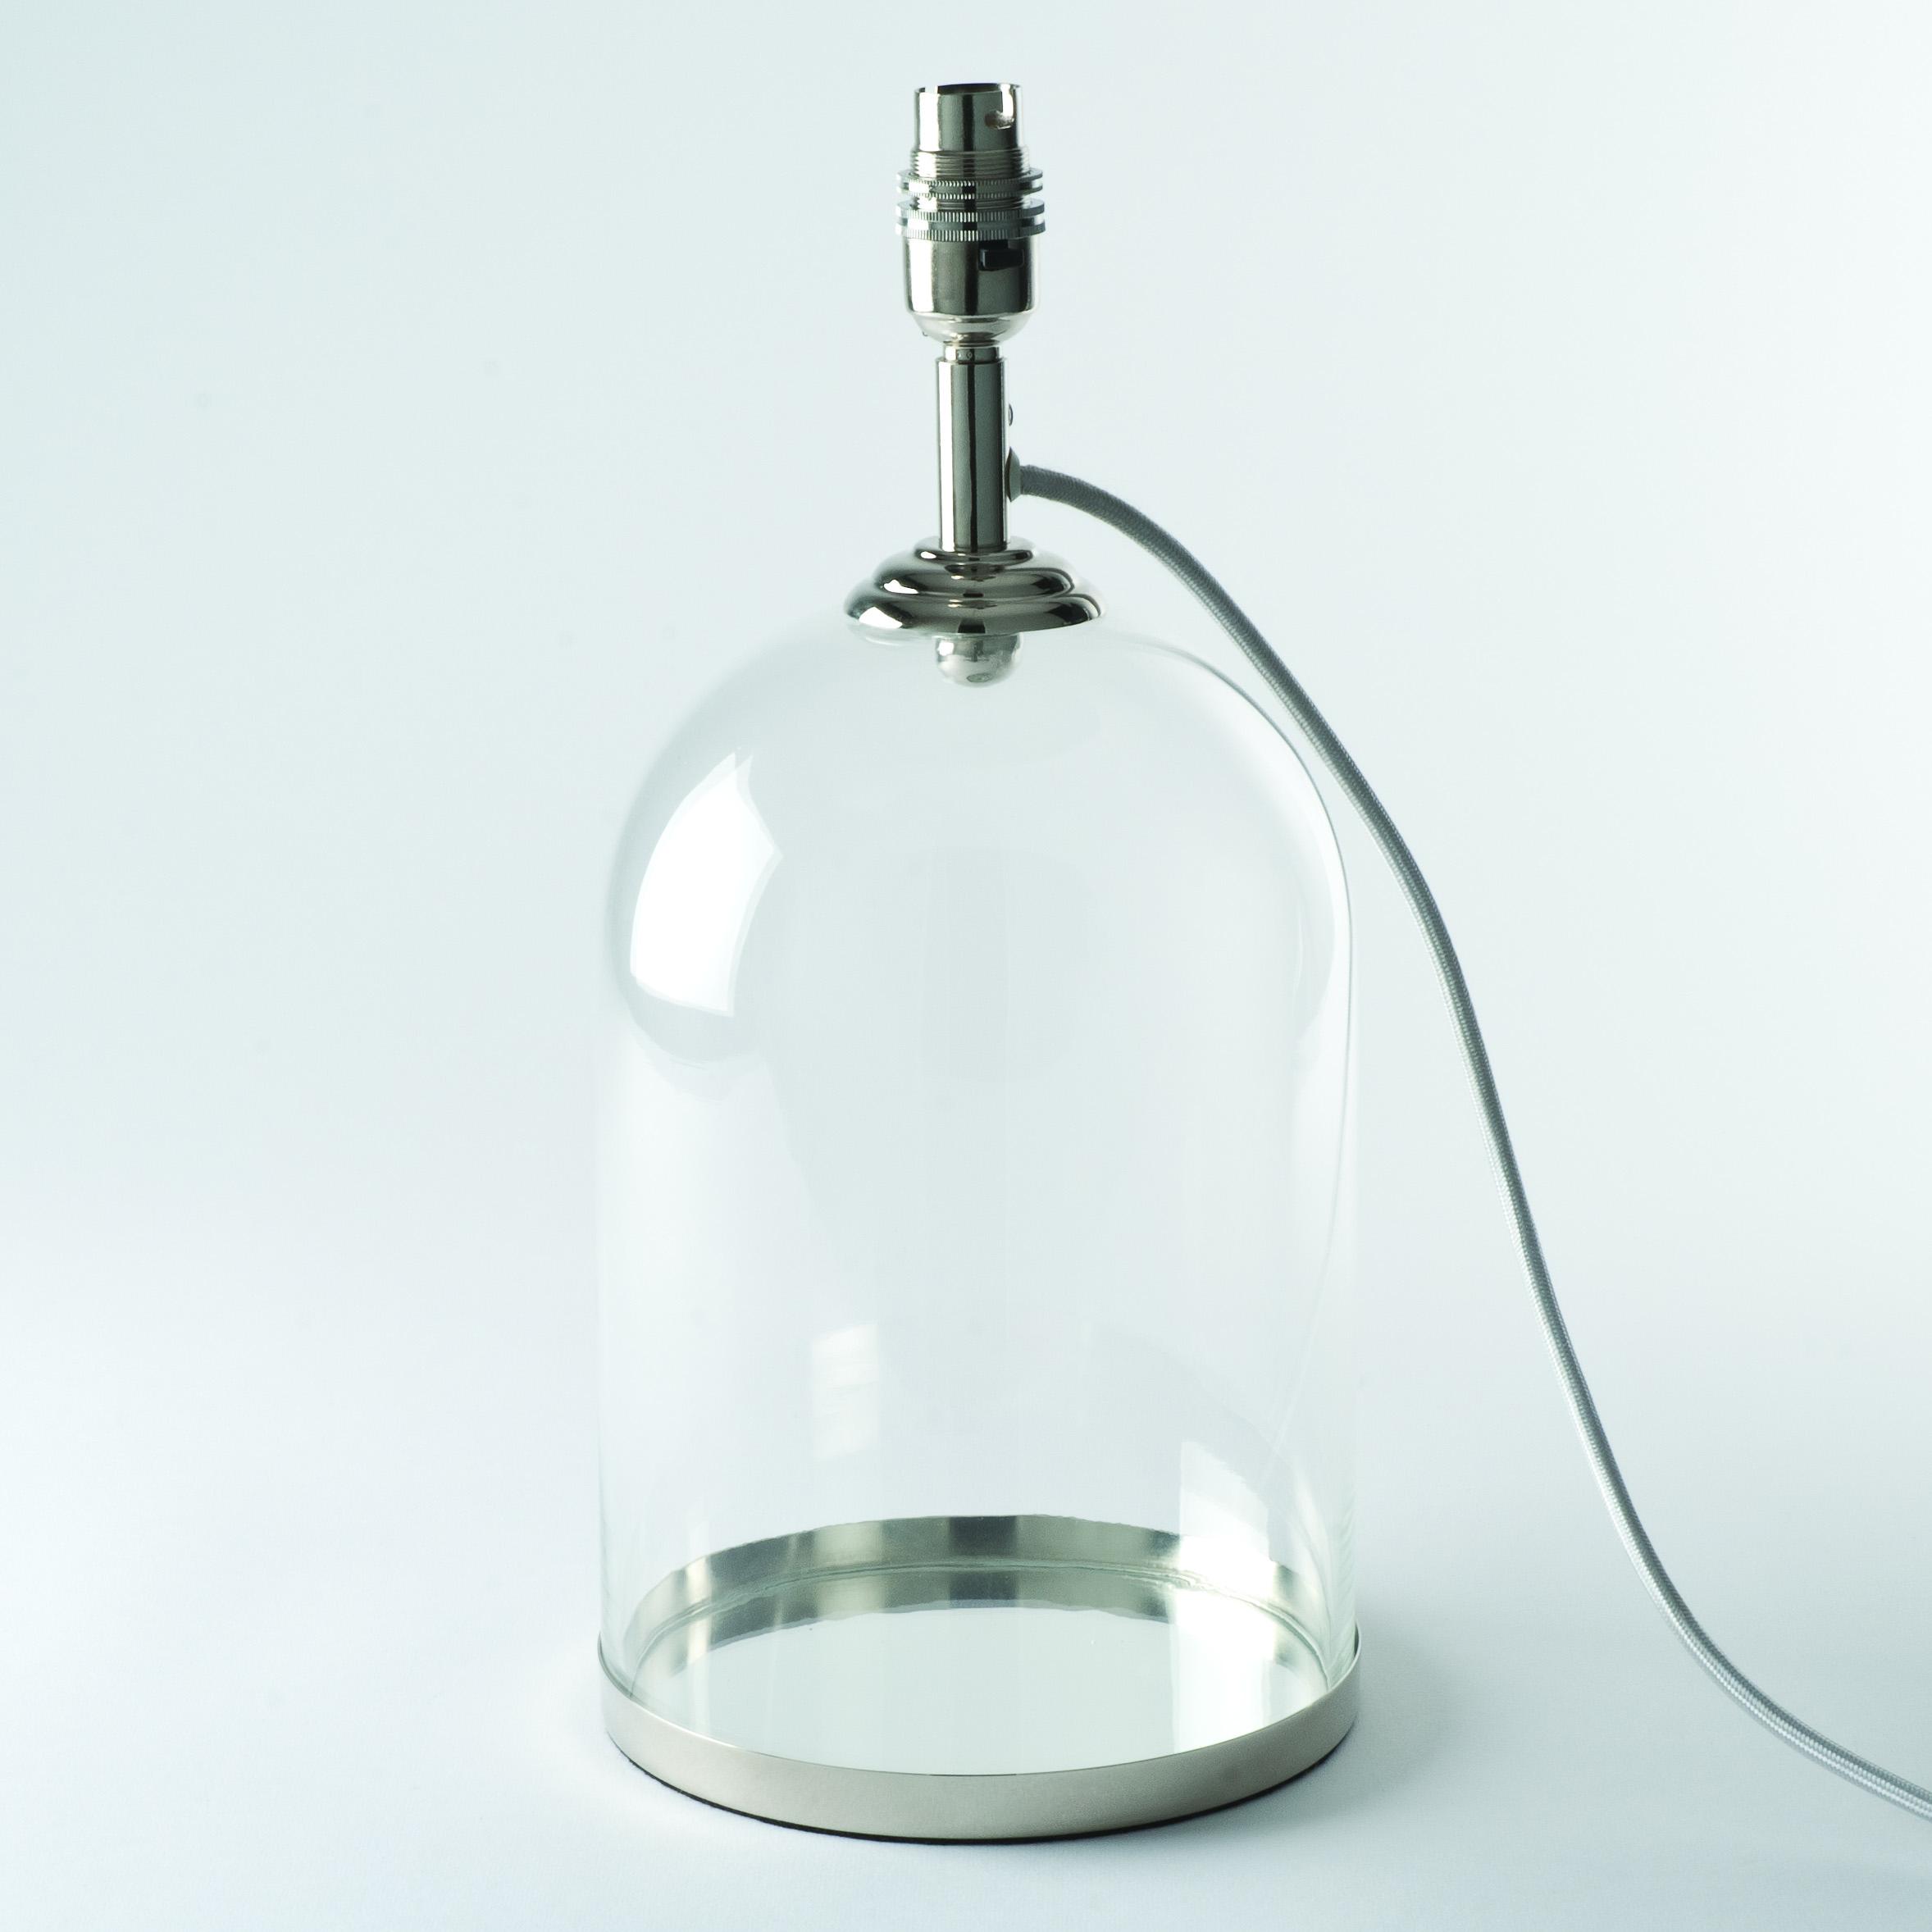 glass cloche design table lamp bases bedside lights lamps new. Black Bedroom Furniture Sets. Home Design Ideas